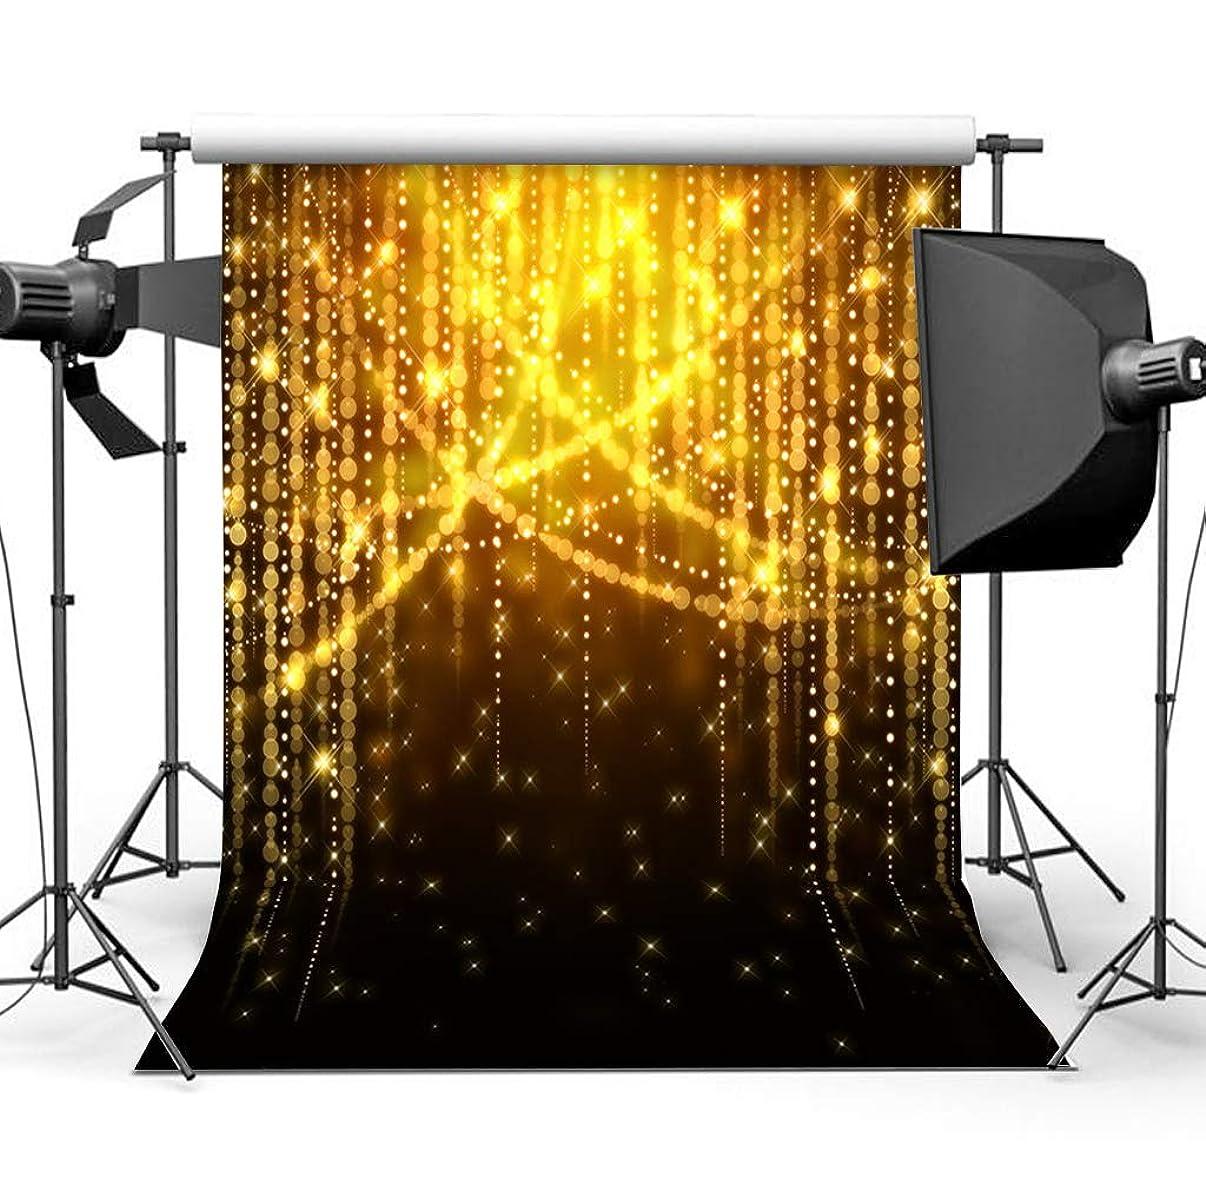 Sensfun 5x7ft Seamless Vinyl Black Bokeh Golden Glittering Backdrop Wedding Sparkle Lighting Party Decoration Digital Printed Photo Background Studio Video Props